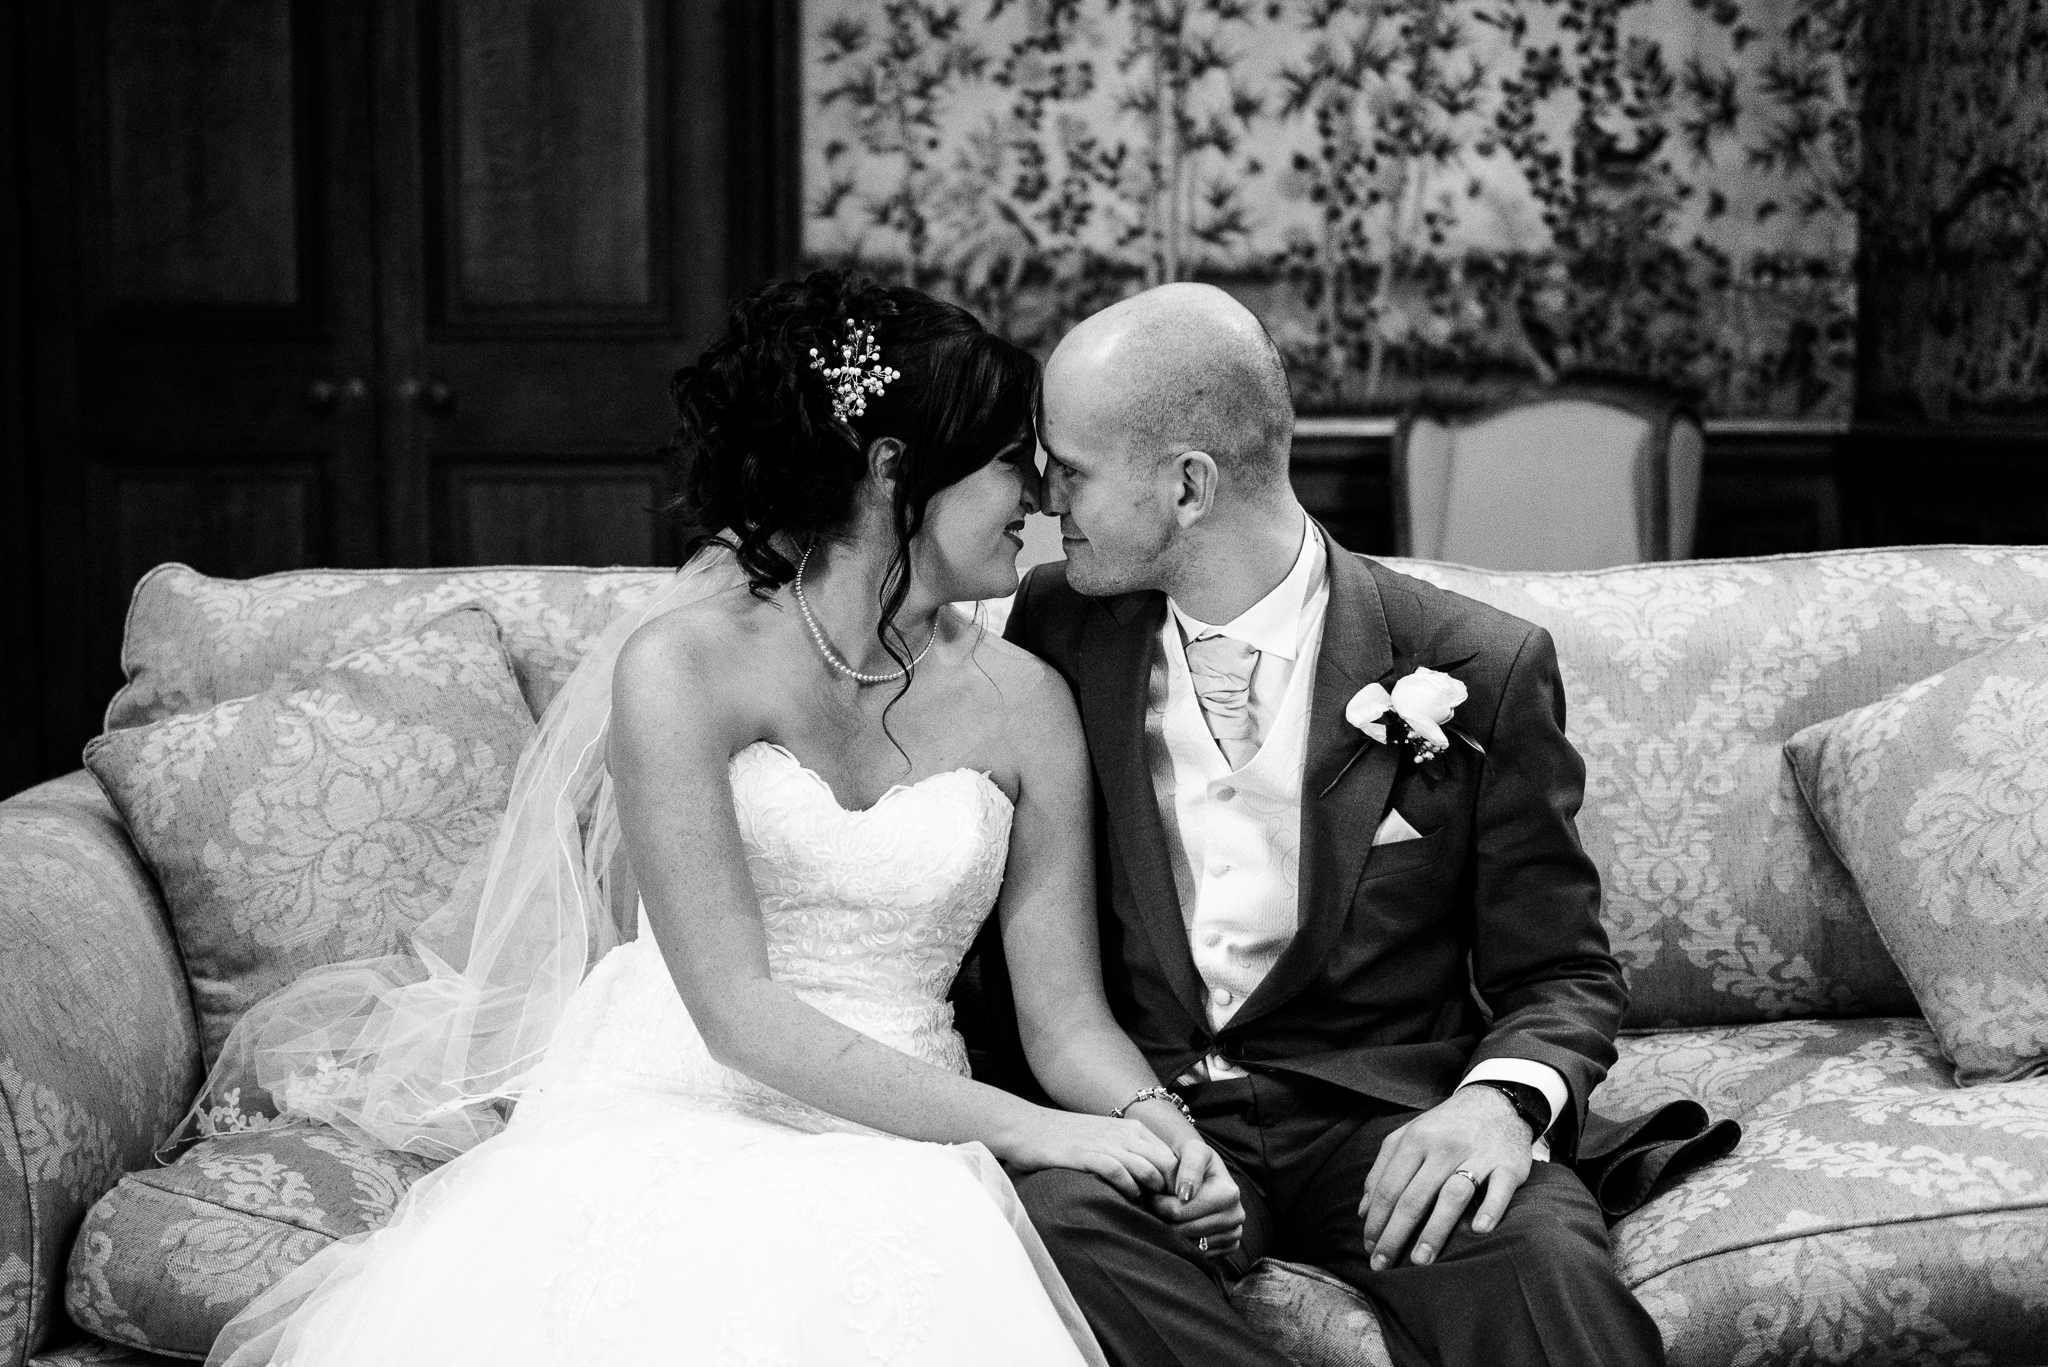 Snow Winter Wedding at Sandon Hall, Staffordshire - Jenny Harper-47.jpg